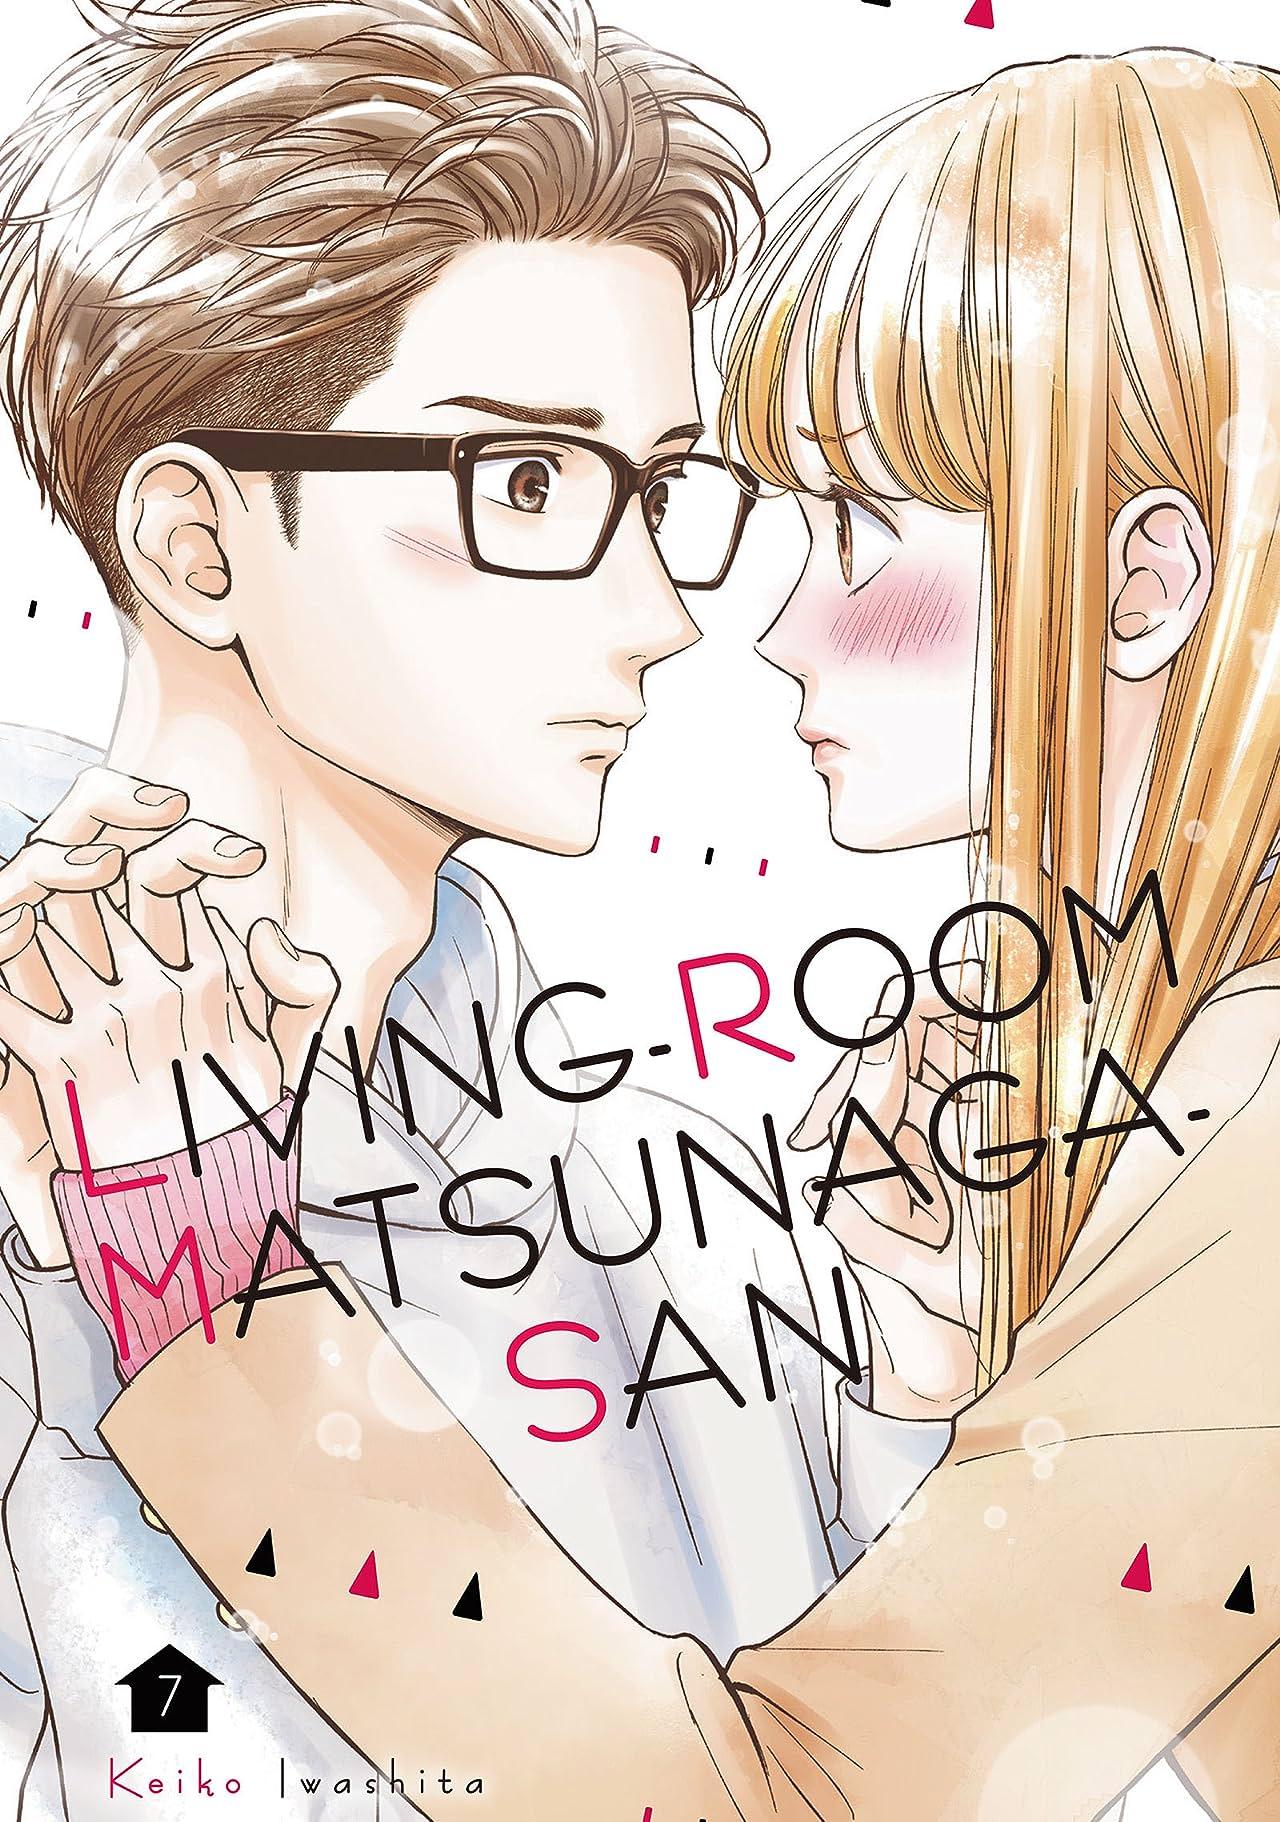 Living-Room Matsunaga-san Vol. 7